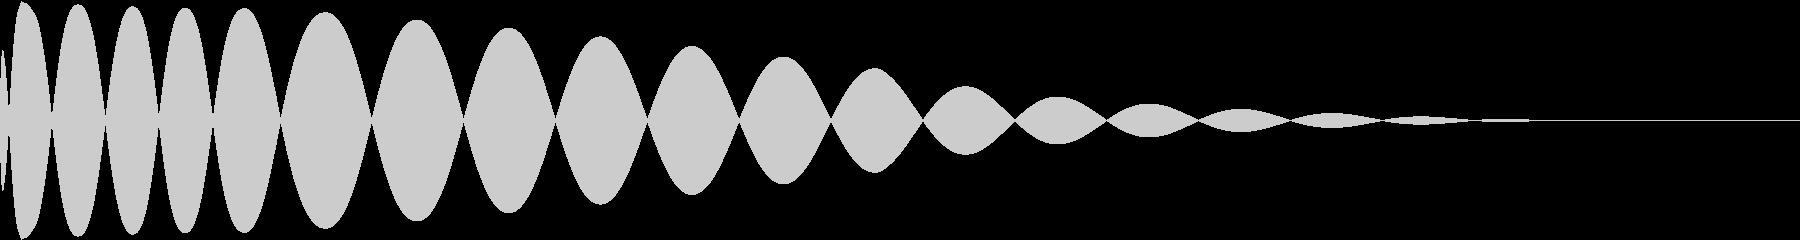 DTM Kick 11 オリジナル音源の未再生の波形